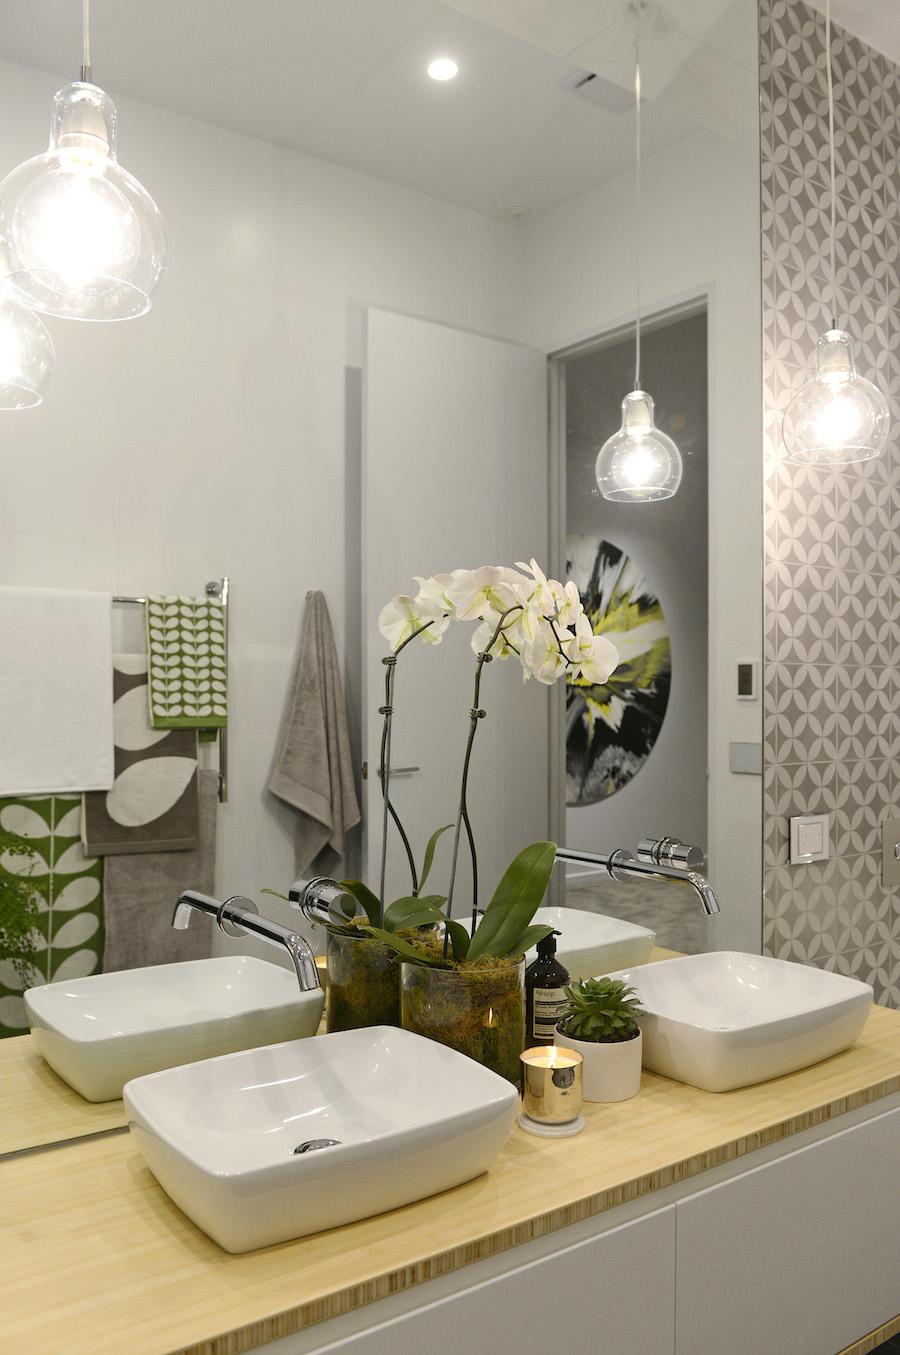 The block glasshouse apartment 6 week 1 - Bathroom lighting ideas for vanity ...